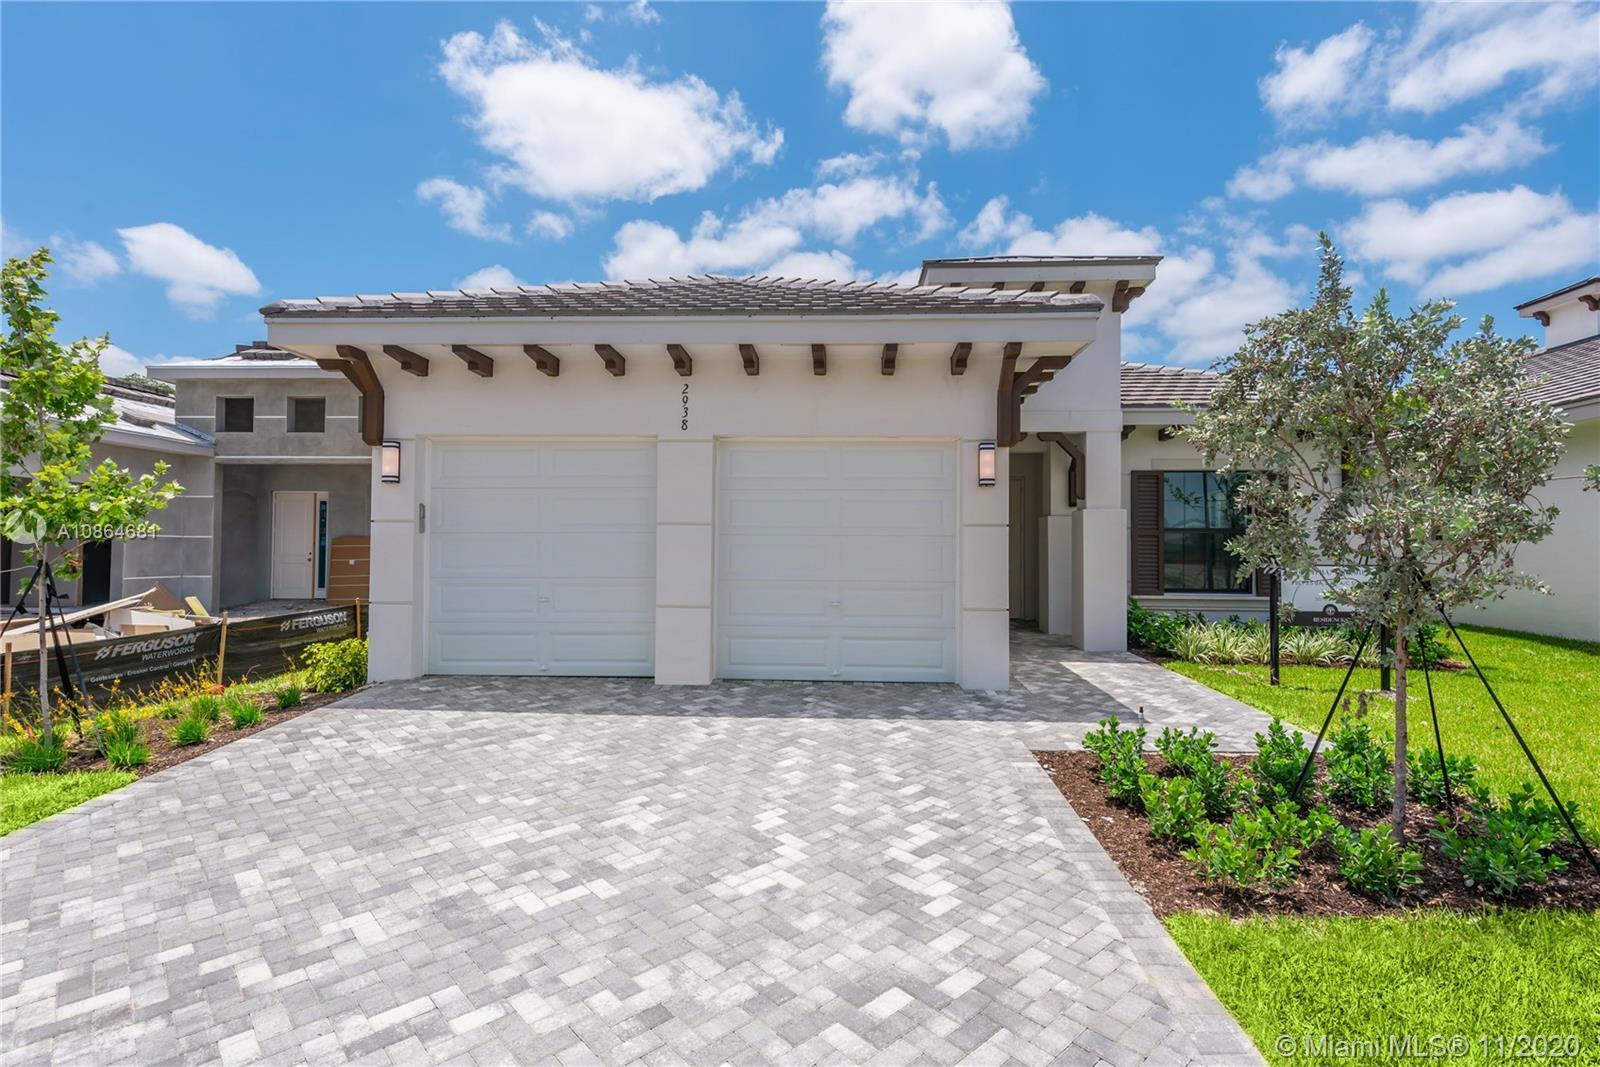 Call the sales center to view this UNDER CONSTRUCTION–Antigua Floorplan w/Premier Elevation floorpla